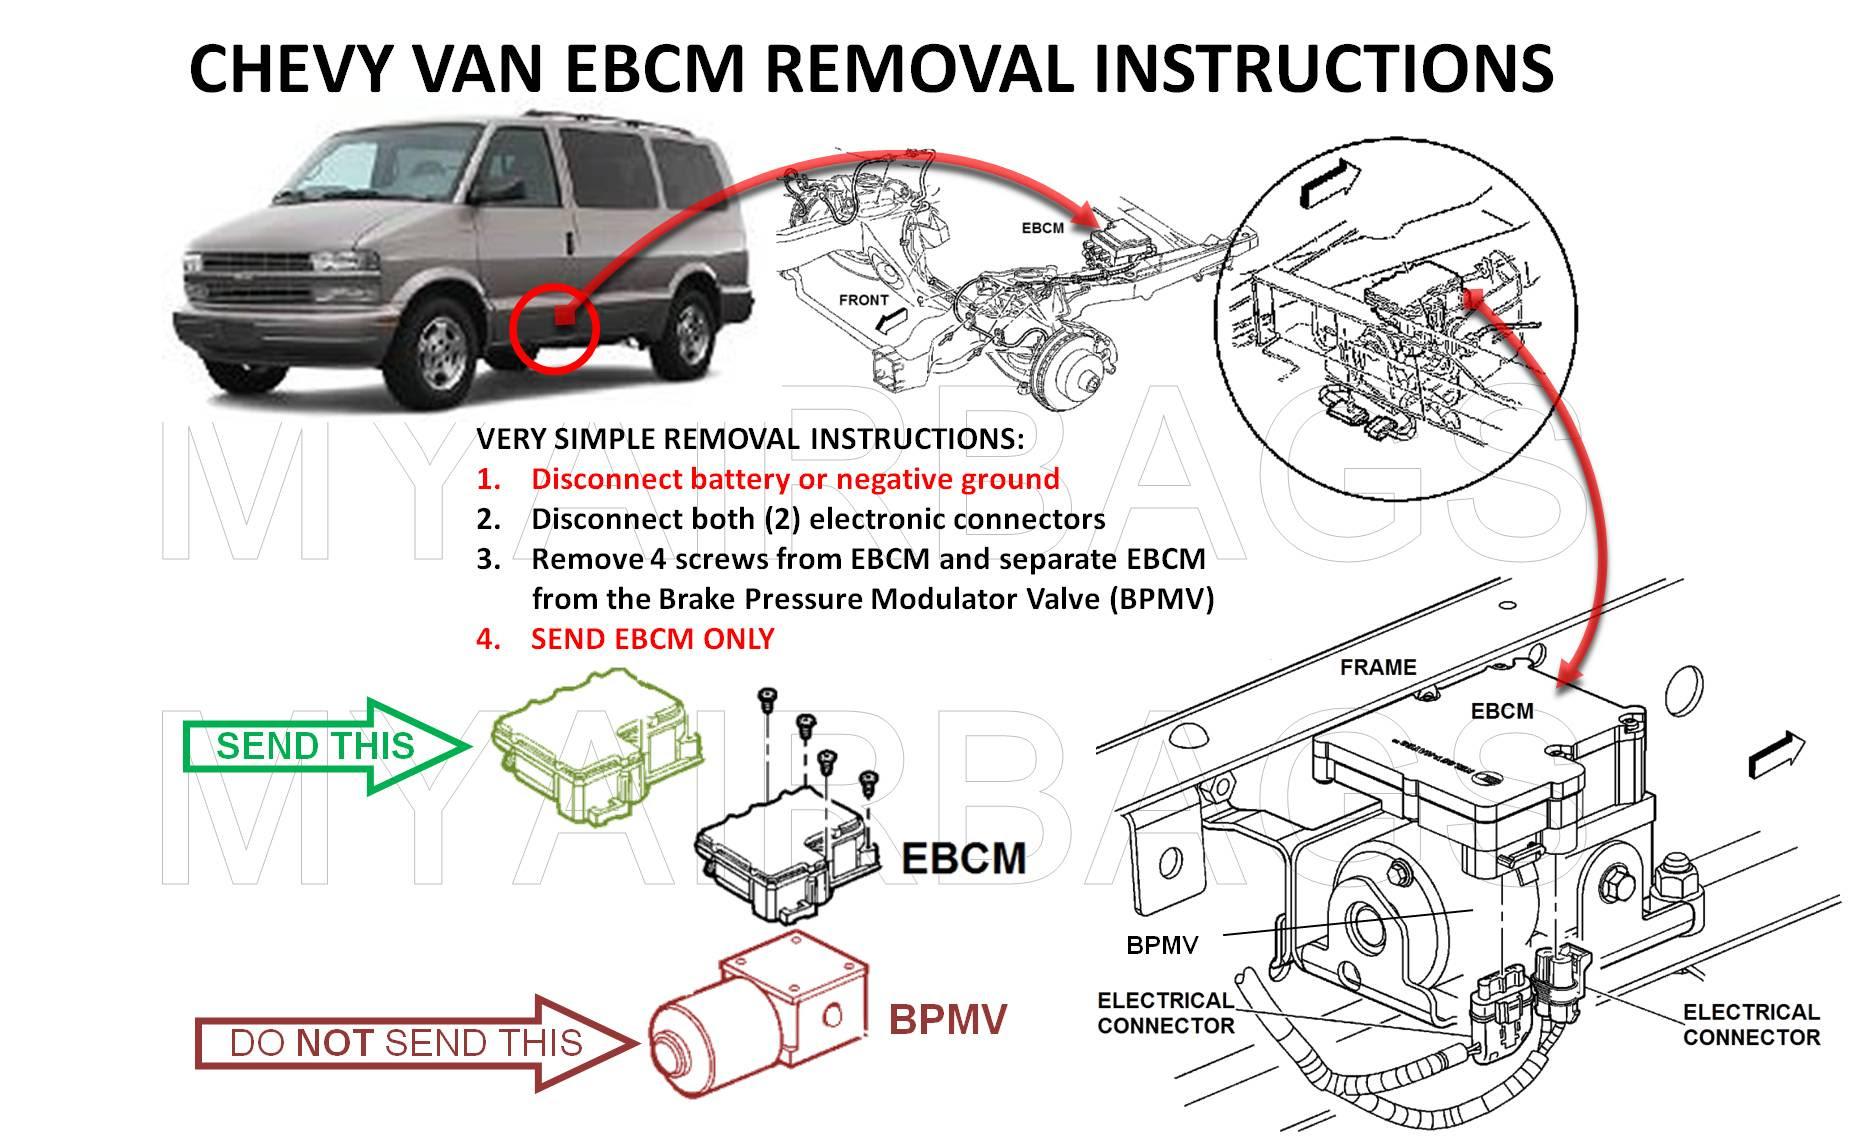 1998 Chevy Astro Van Engine Diagram Wiring Diagram Left Pure Left Pure Lechicchedimammavale It